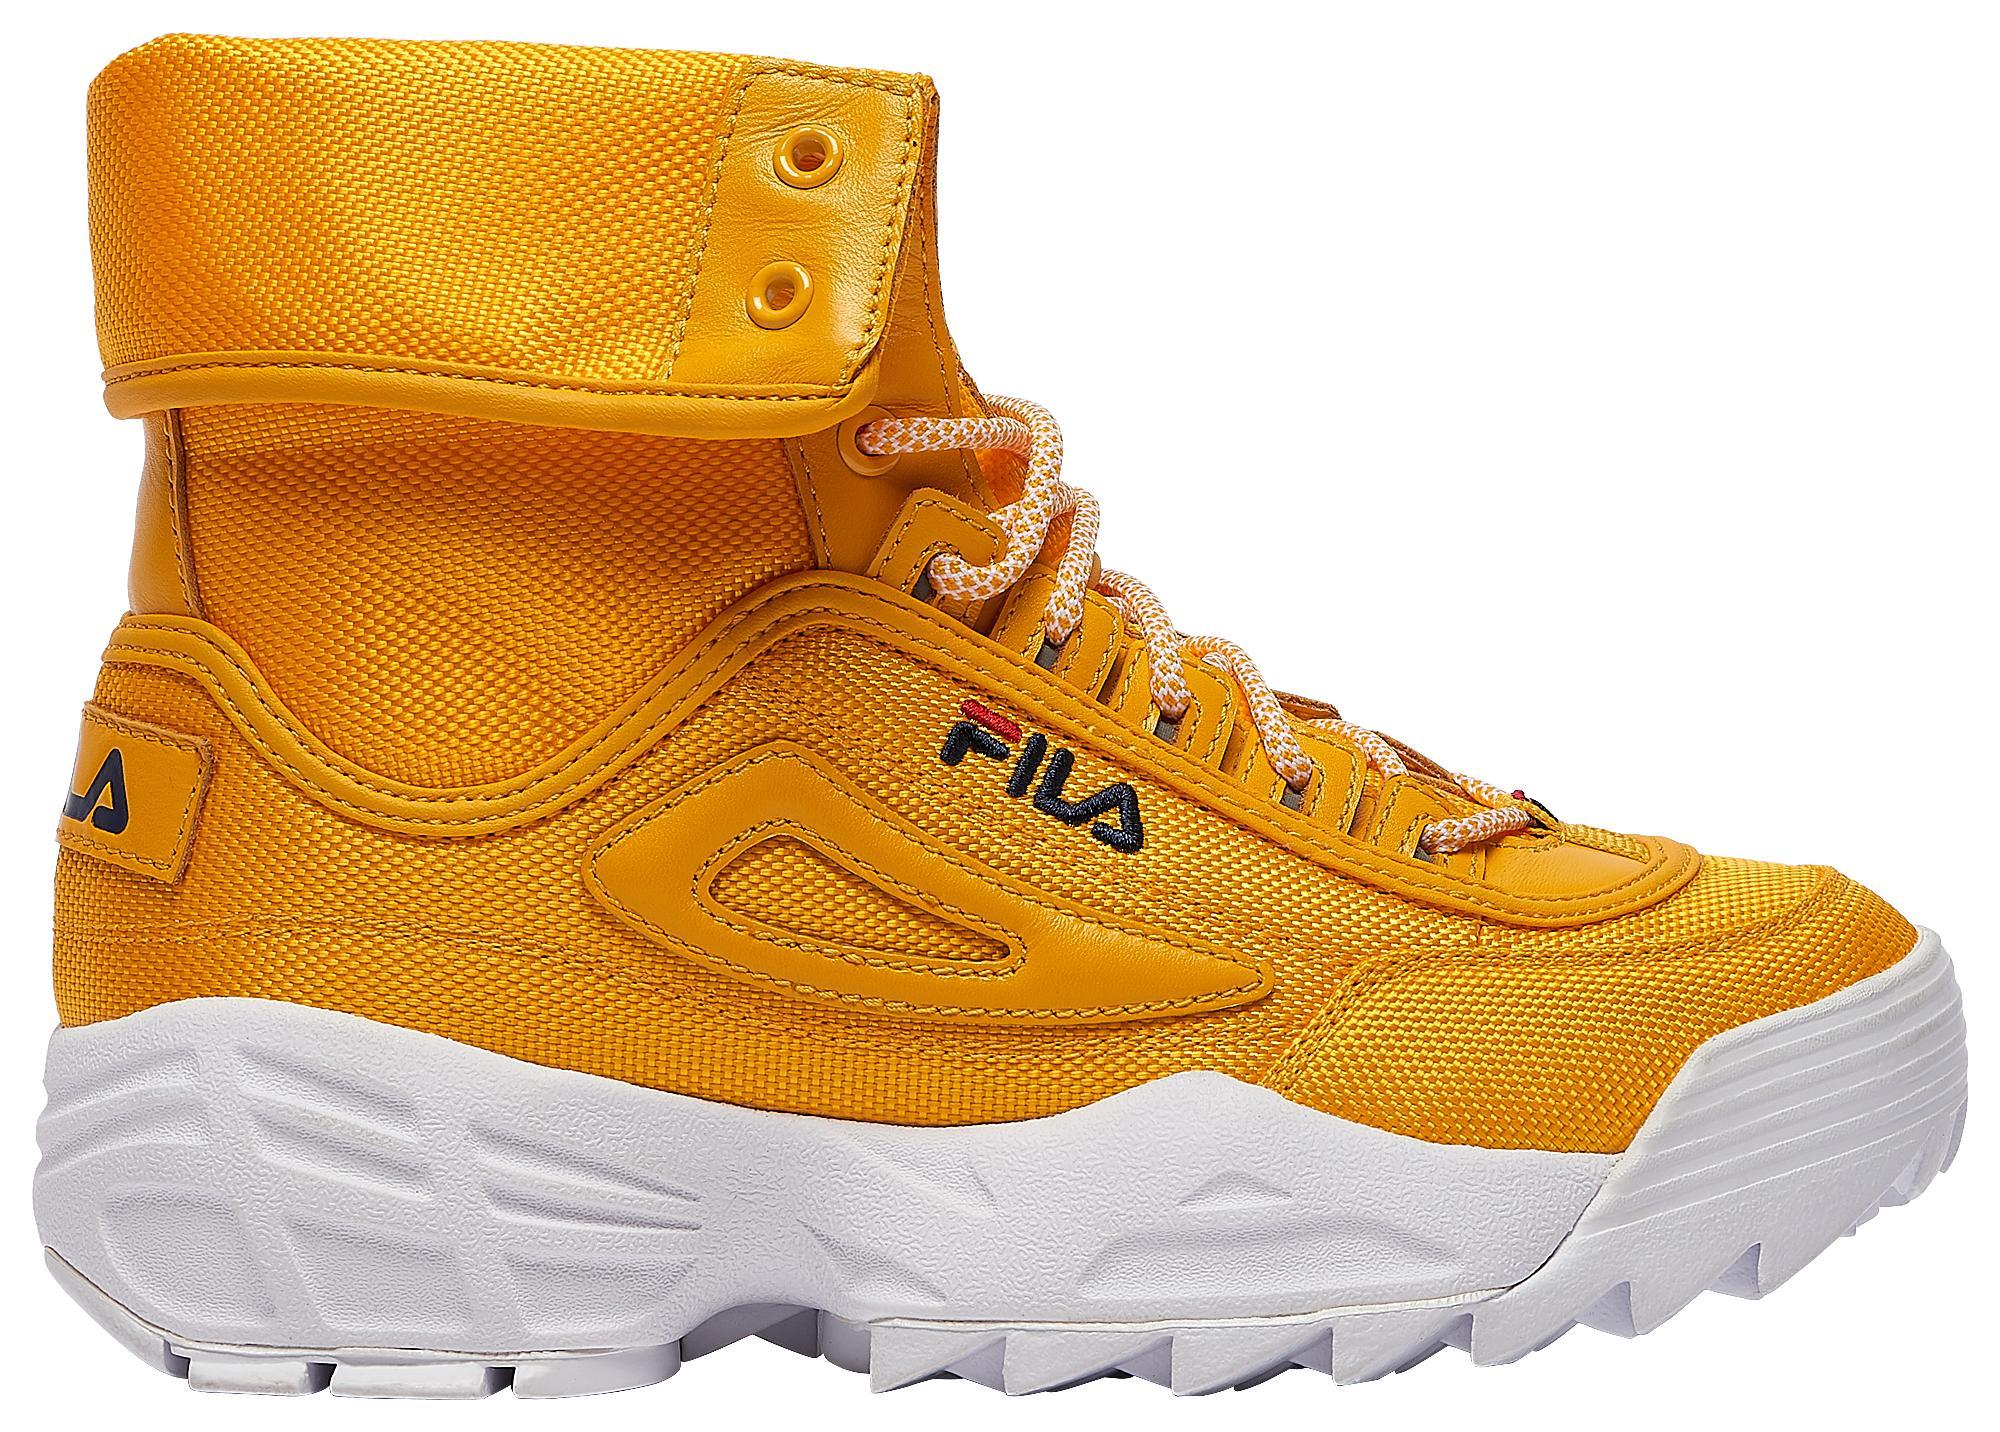 Fila Synthetic Disruptor Ballistic Boot